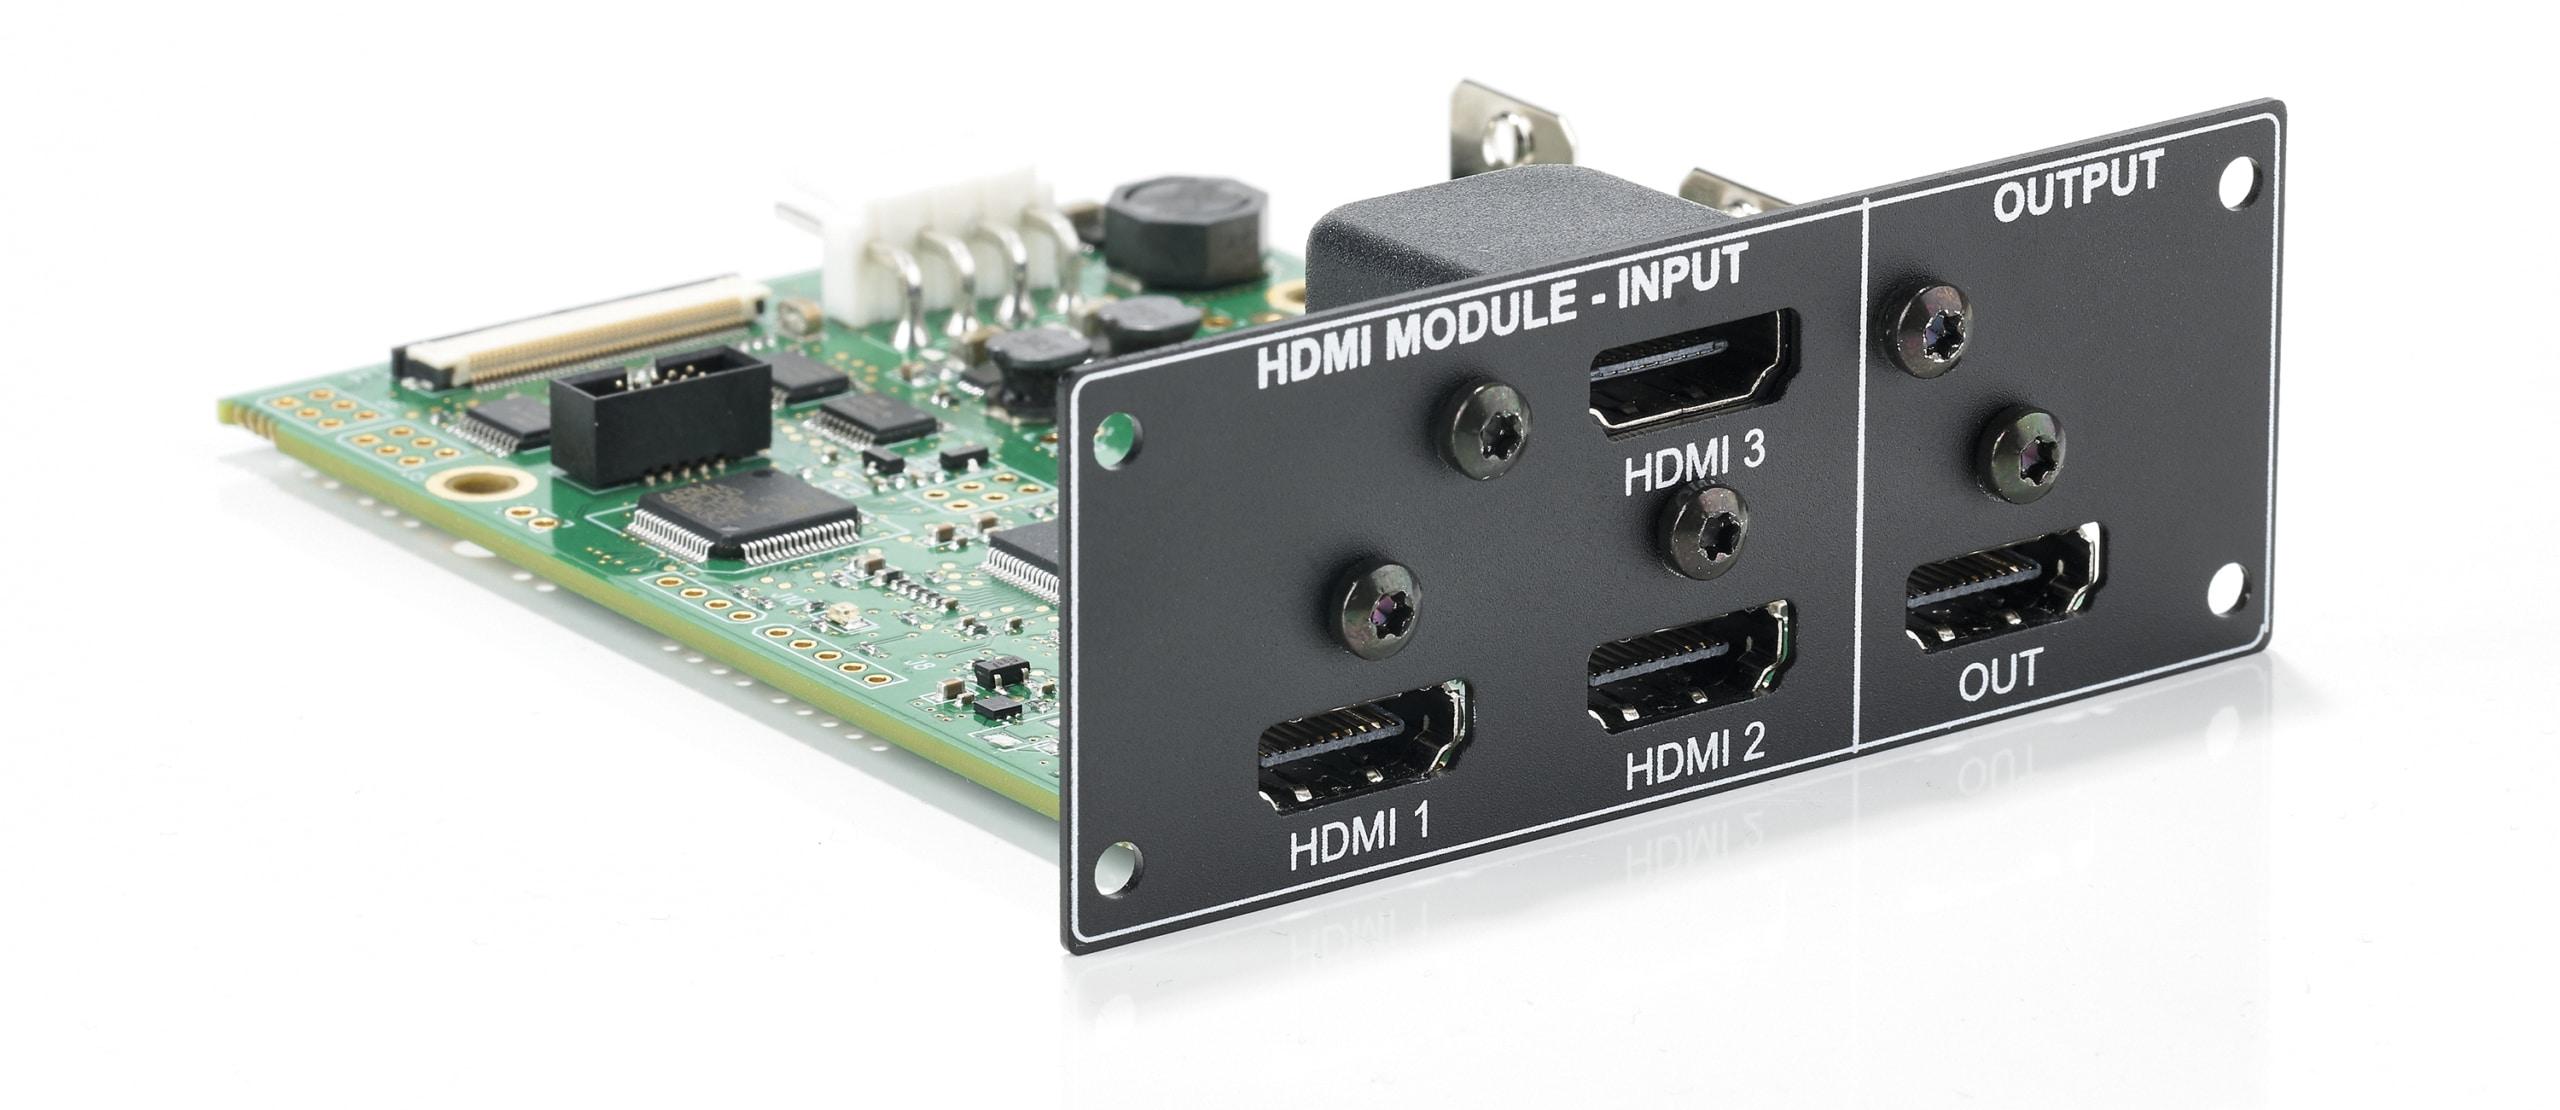 HDMI 4k module